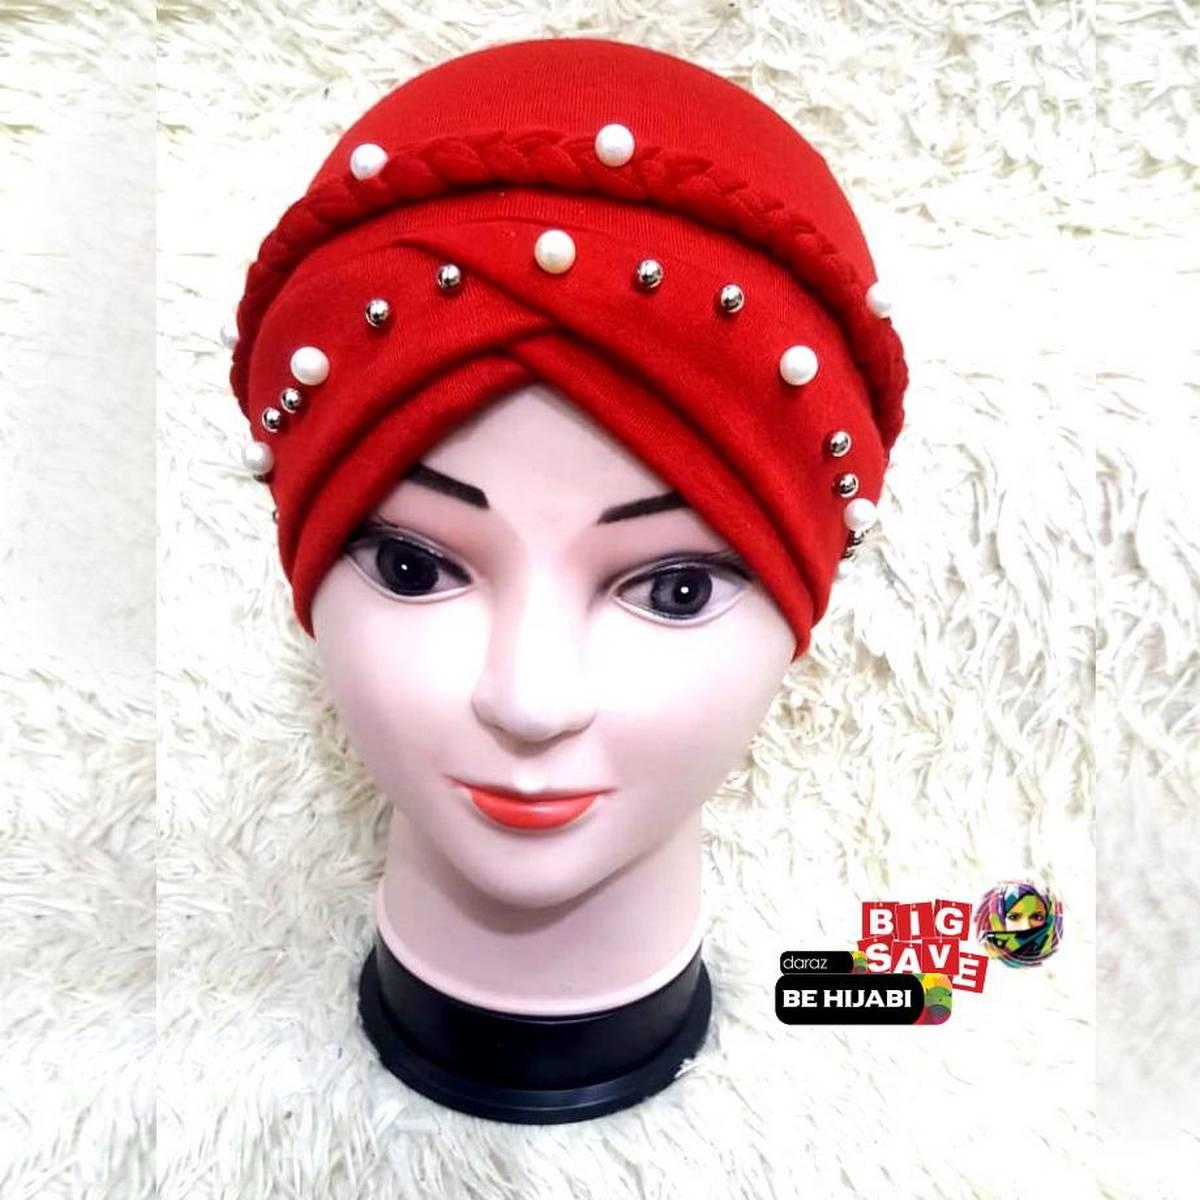 Red European Monochrome Single Nail Silver Pearl Whip Muslim jersey hijab caps Scarf Hat headscarf Be Hijabi